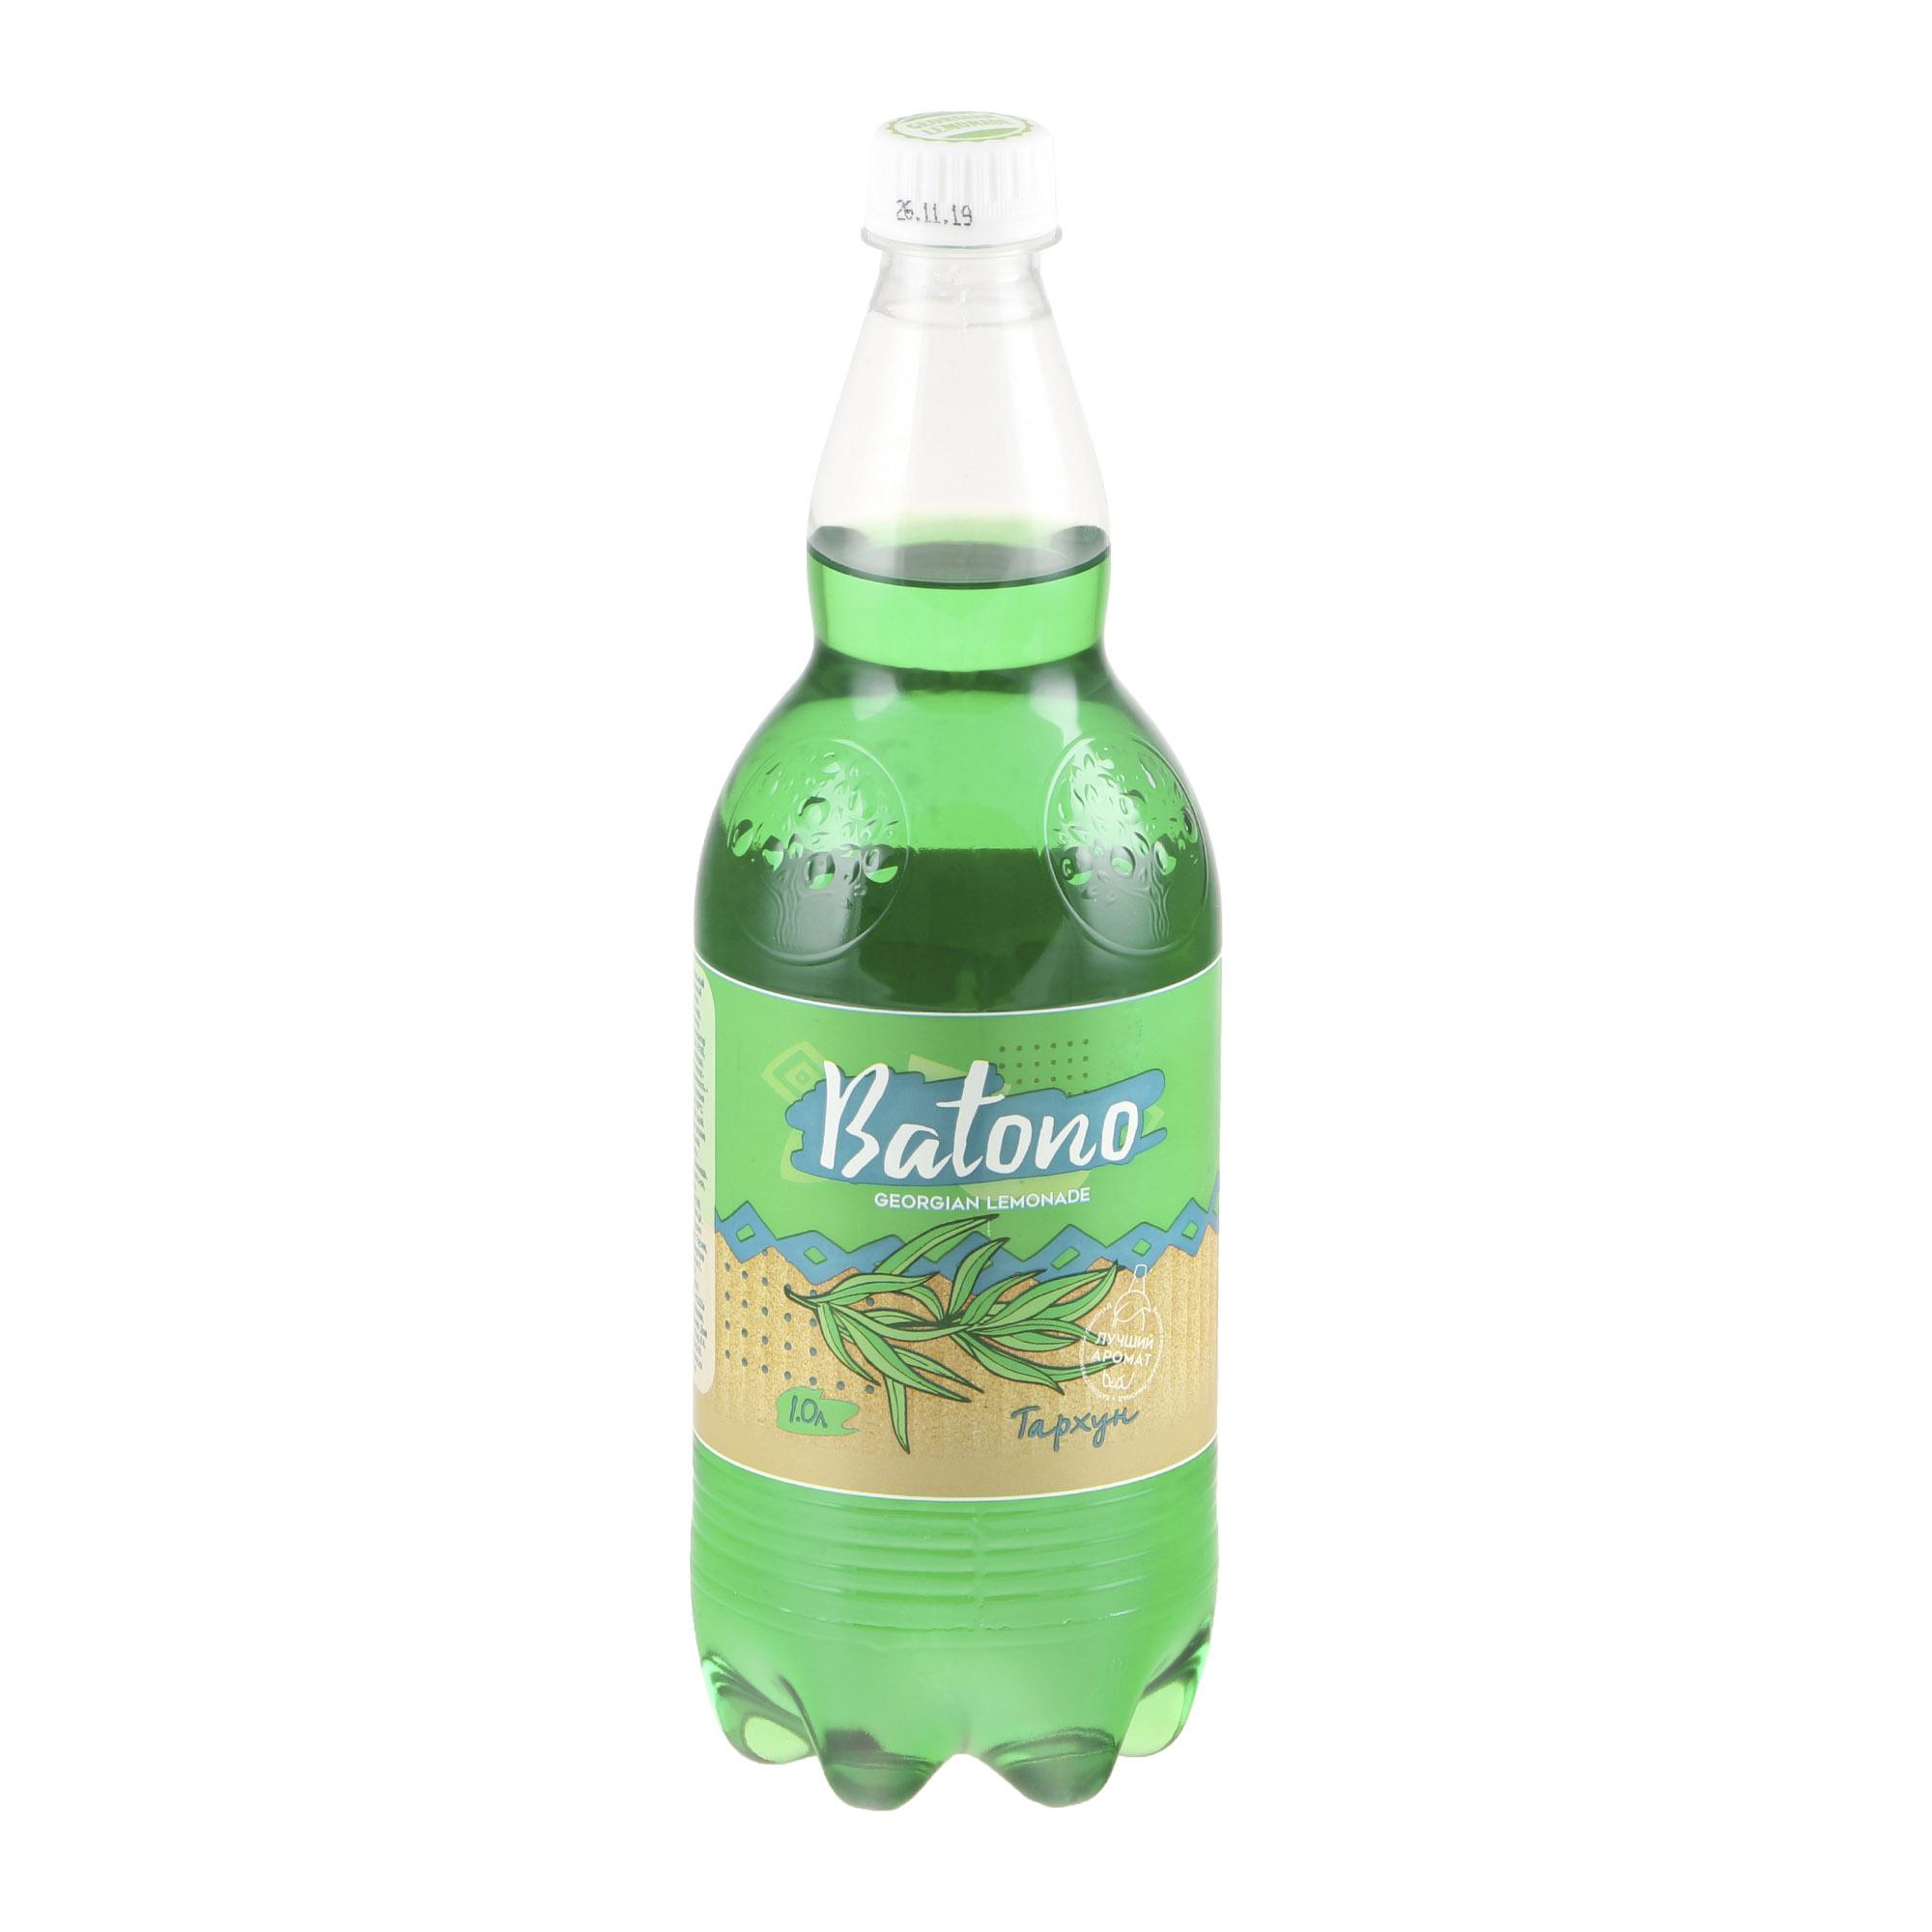 Напиток газированный Batono Тархун 1 л напиток газированный laimon fresh 1 5 л